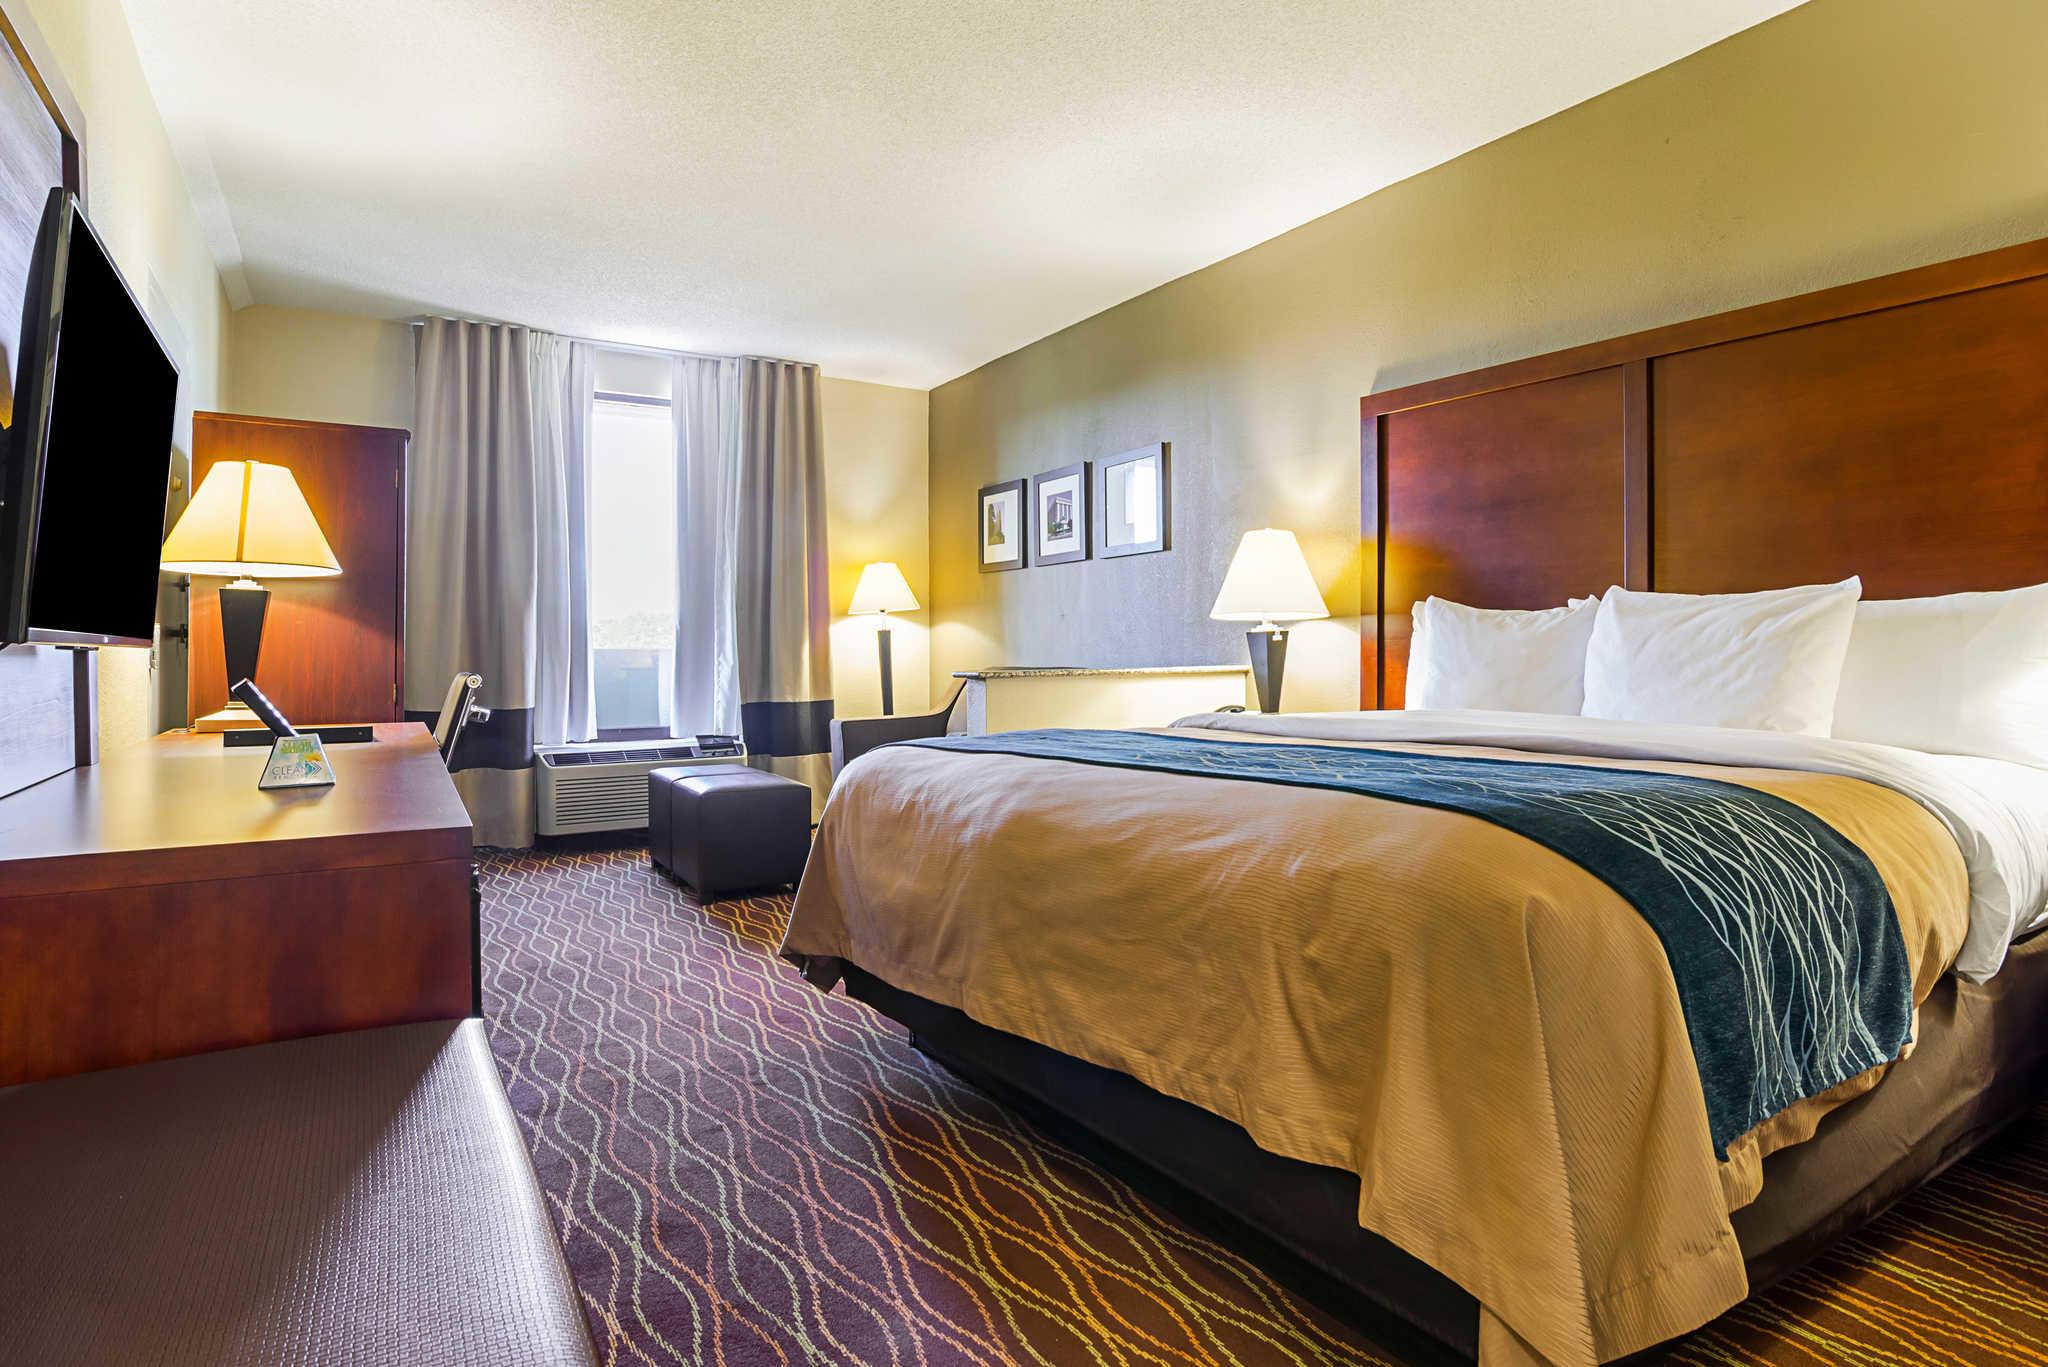 Comfort Inn & Suites Duke University-Downtown image 23